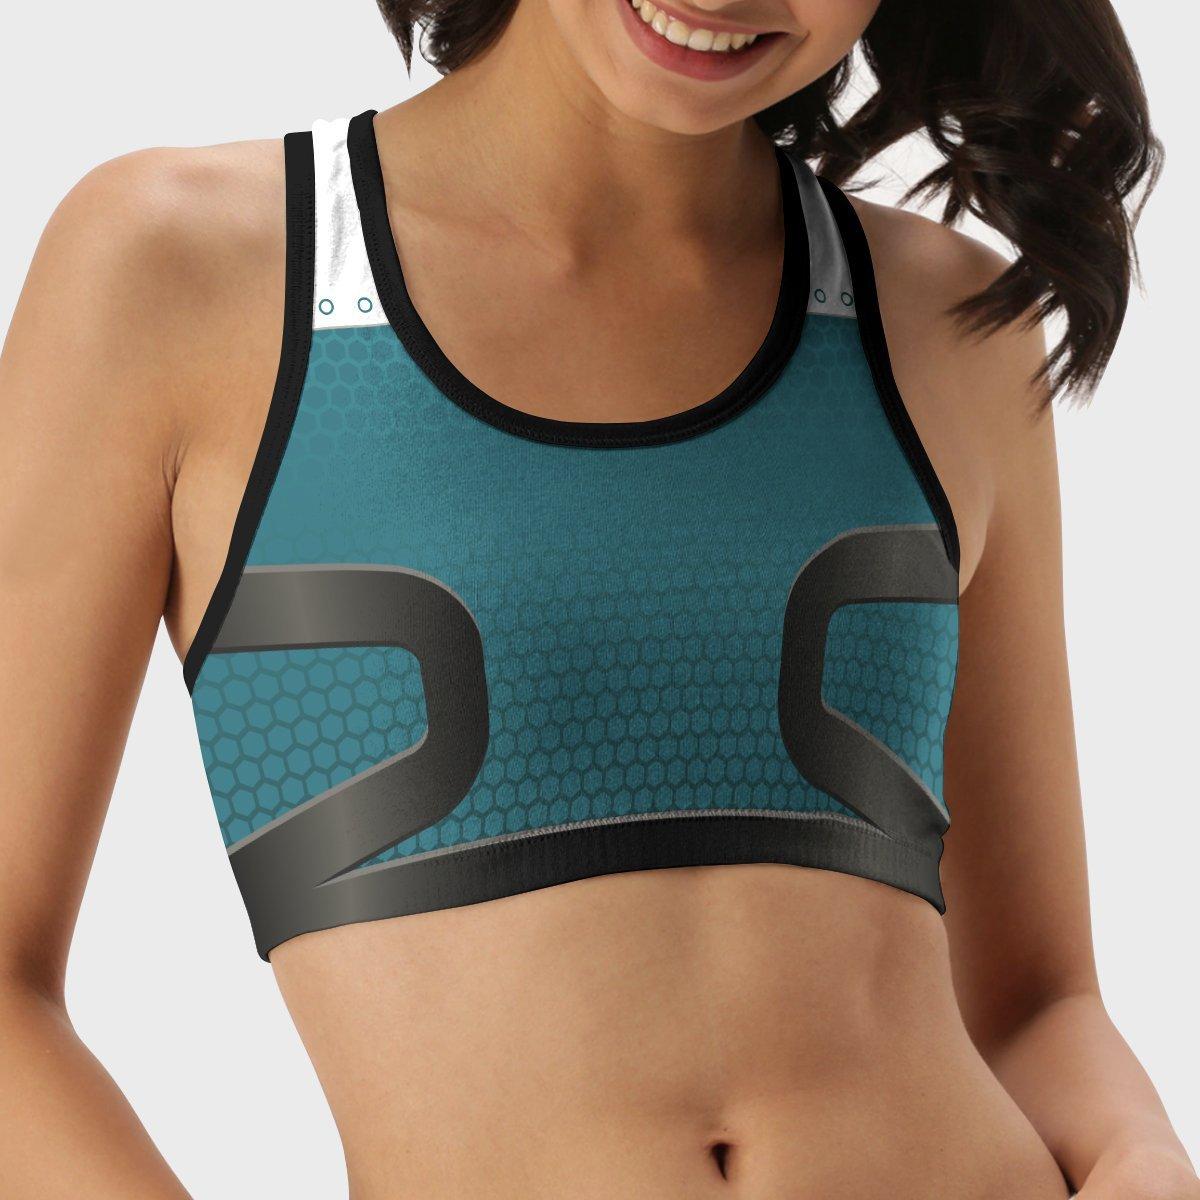 ua high izuku active wear set 913986 - Anime Swimsuits